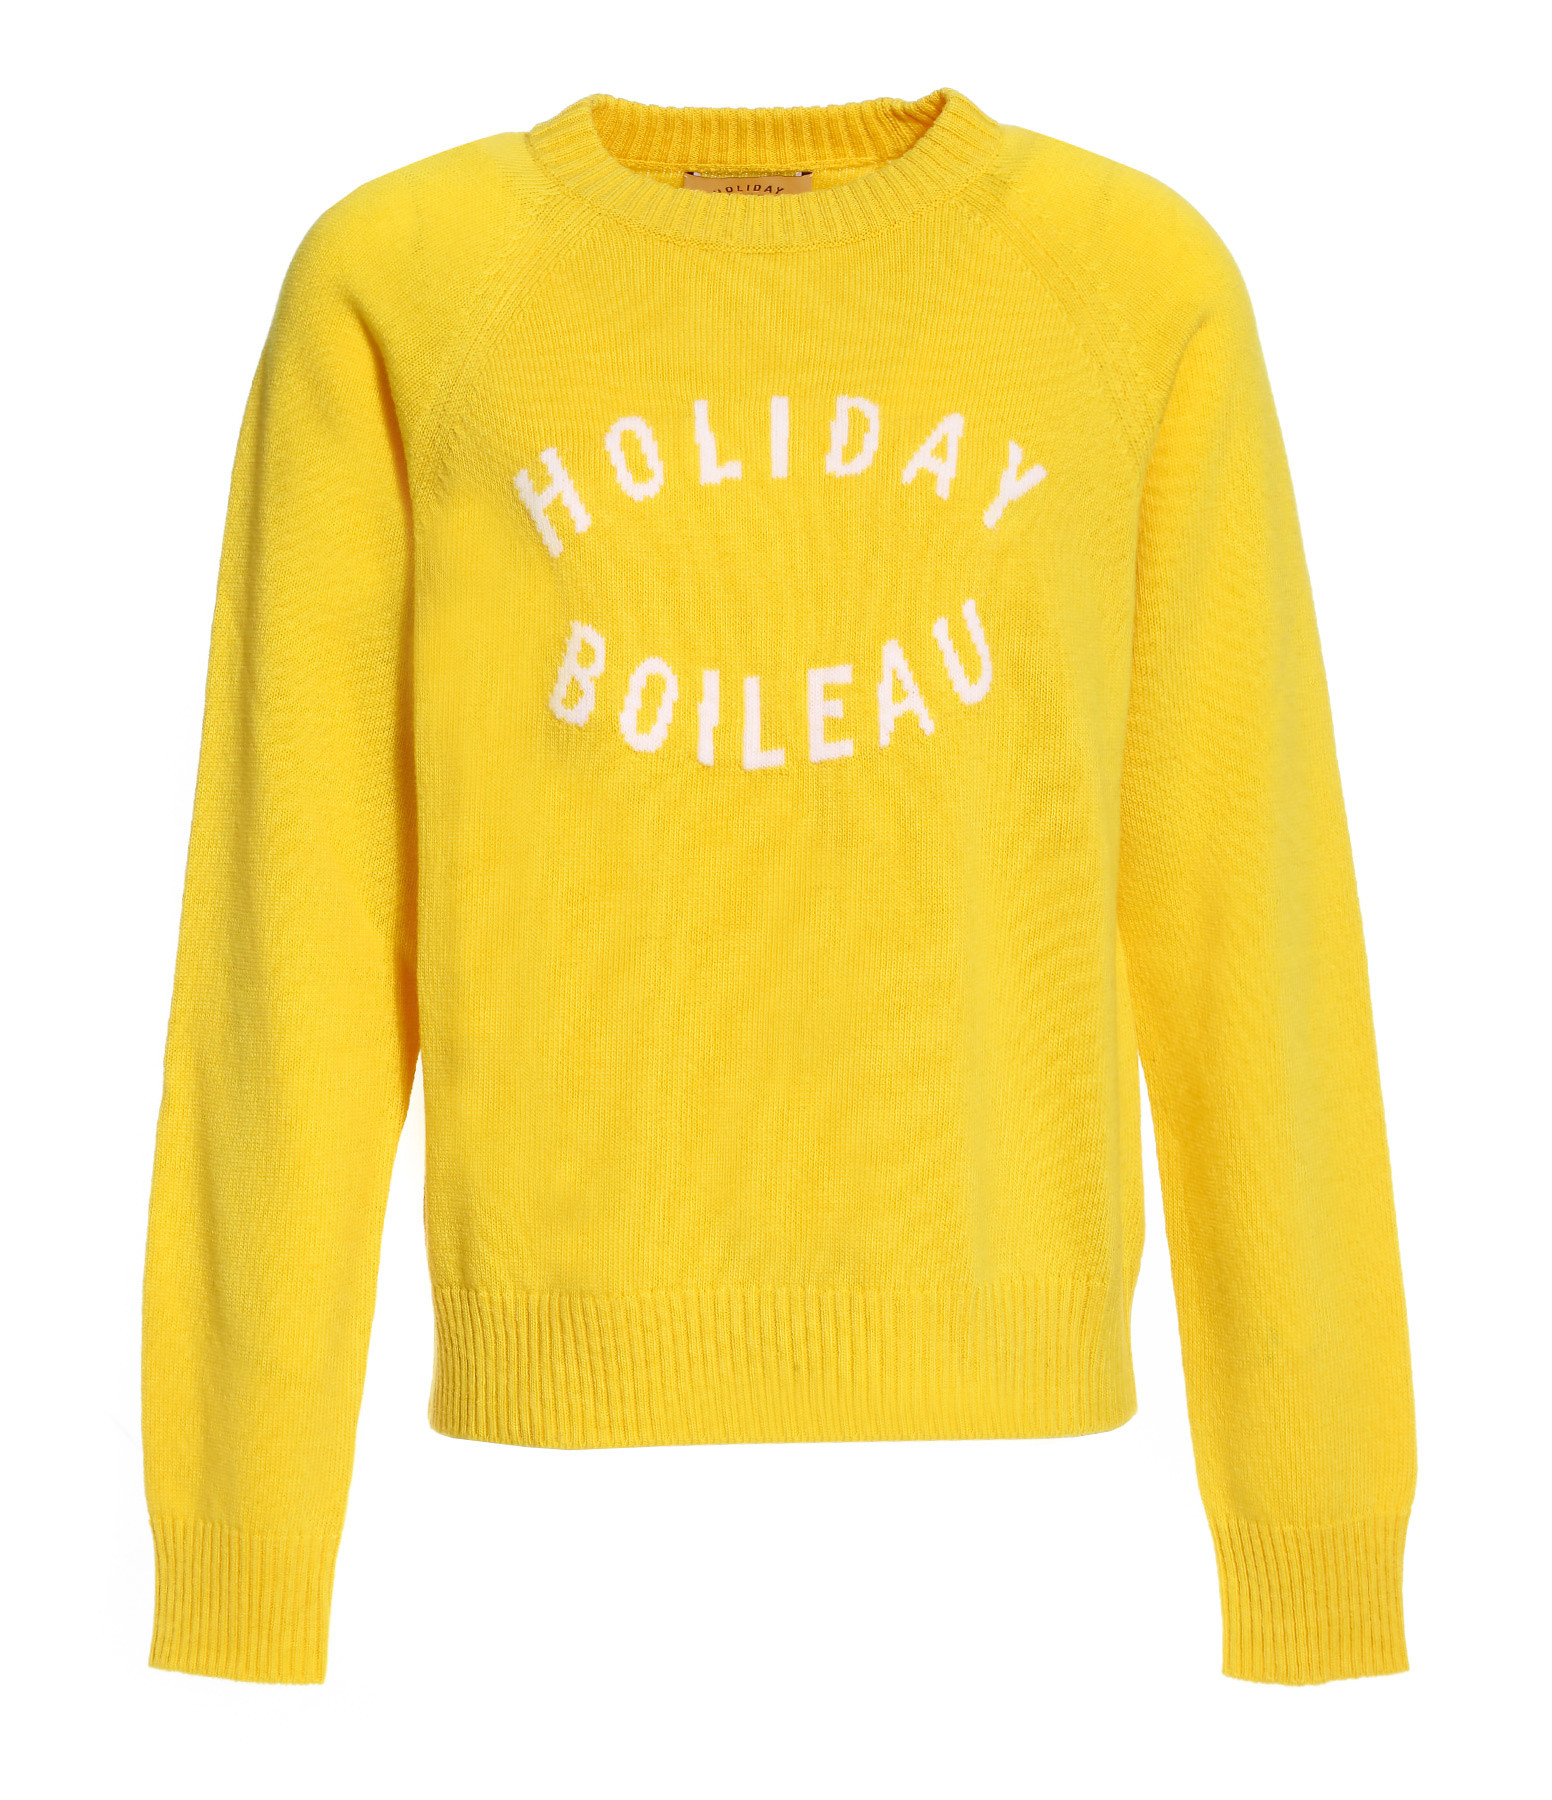 HOLIDAY - Pull Boileau Laine Jaune